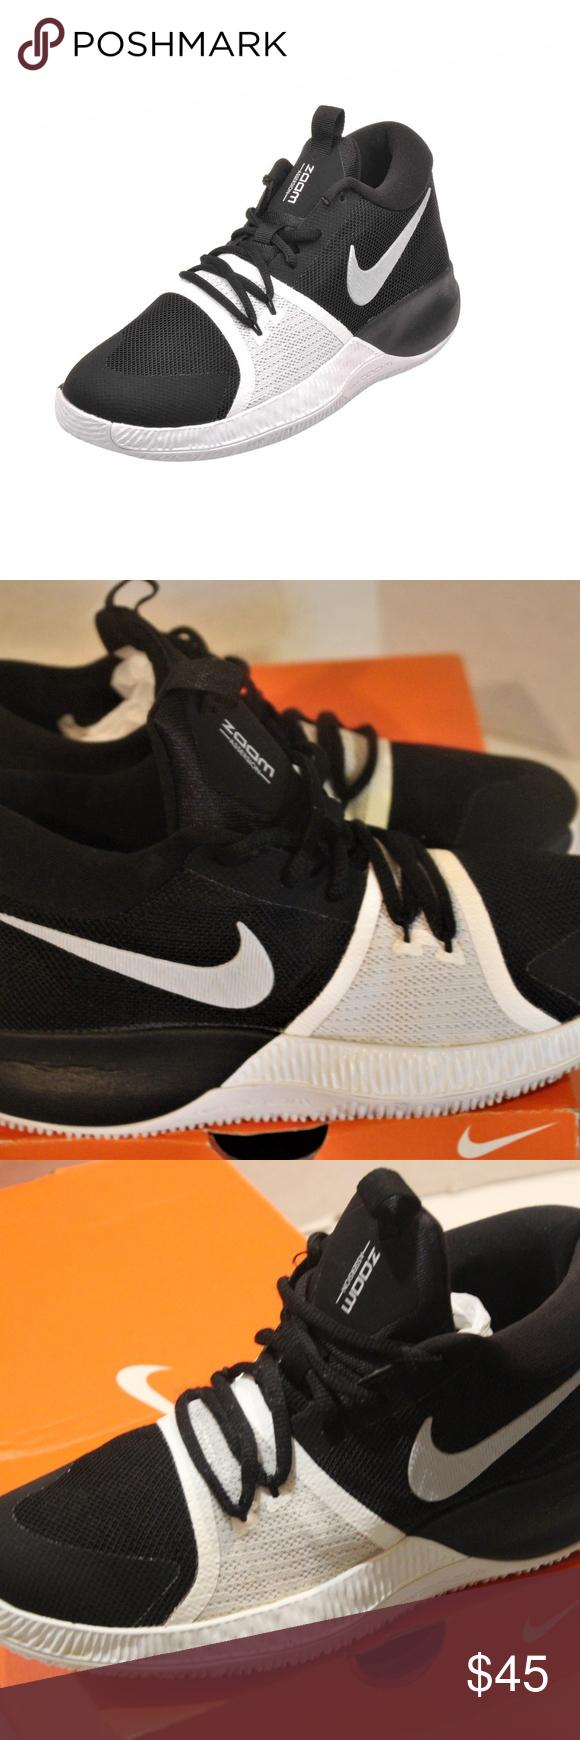 Boys Nike Zoom Assersion Basketball